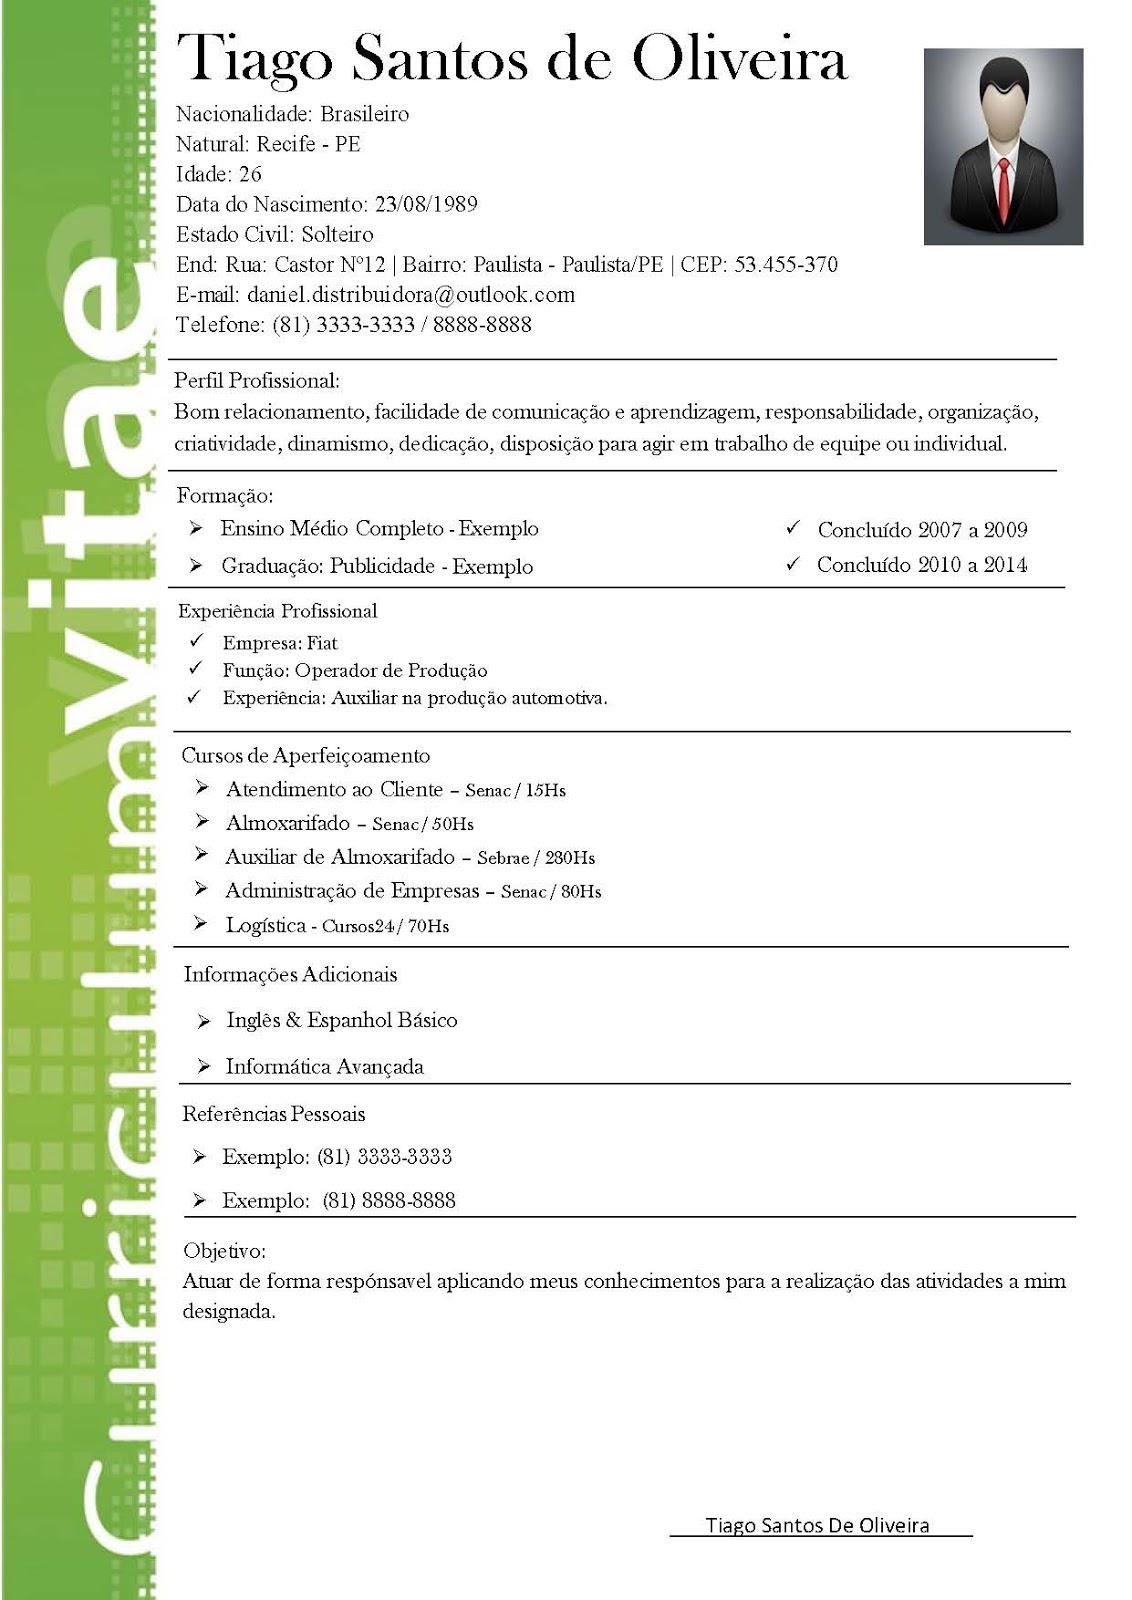 Lujo Muestra De Curriculum Vitae Para Descarga Gratuita De Ojt ...